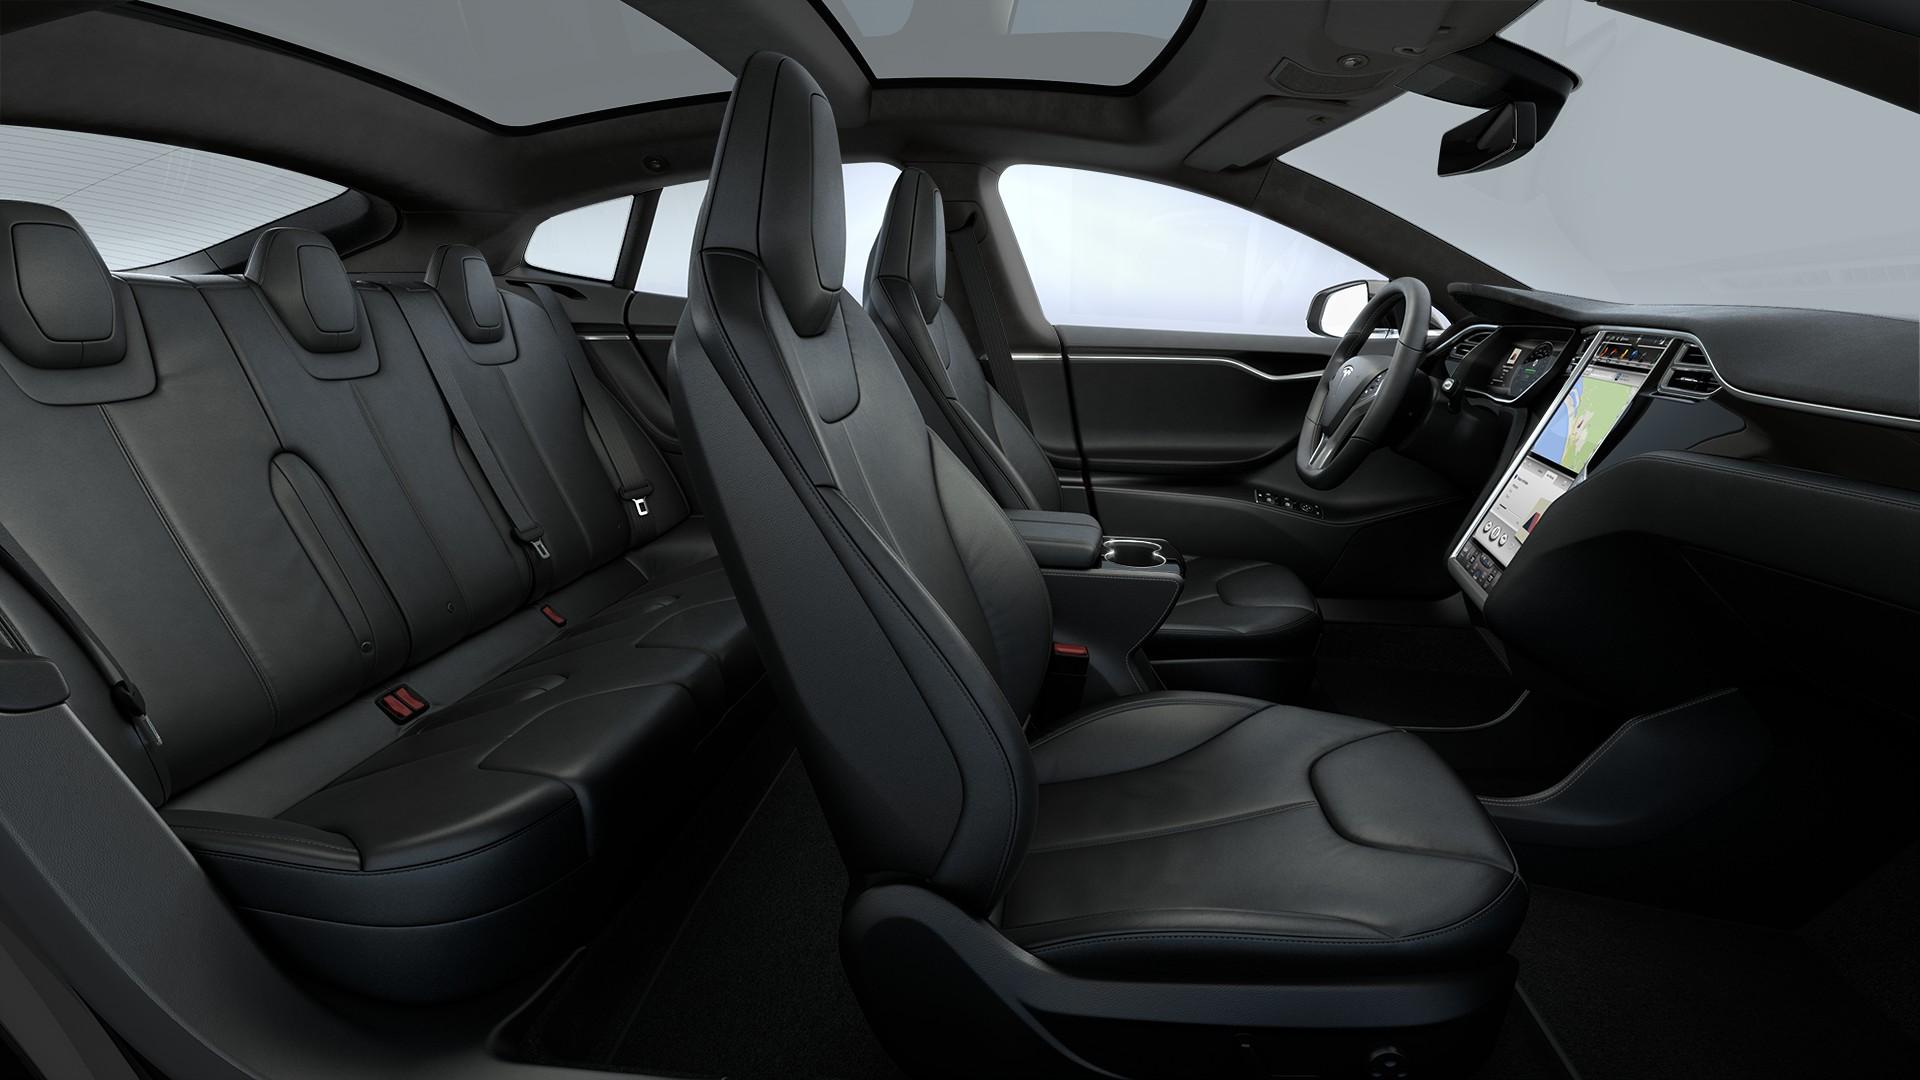 Interieur Black Nappa Leather Seats Piano Black Decor Black Alcantara Headliner Alcantara Dashboard Accents